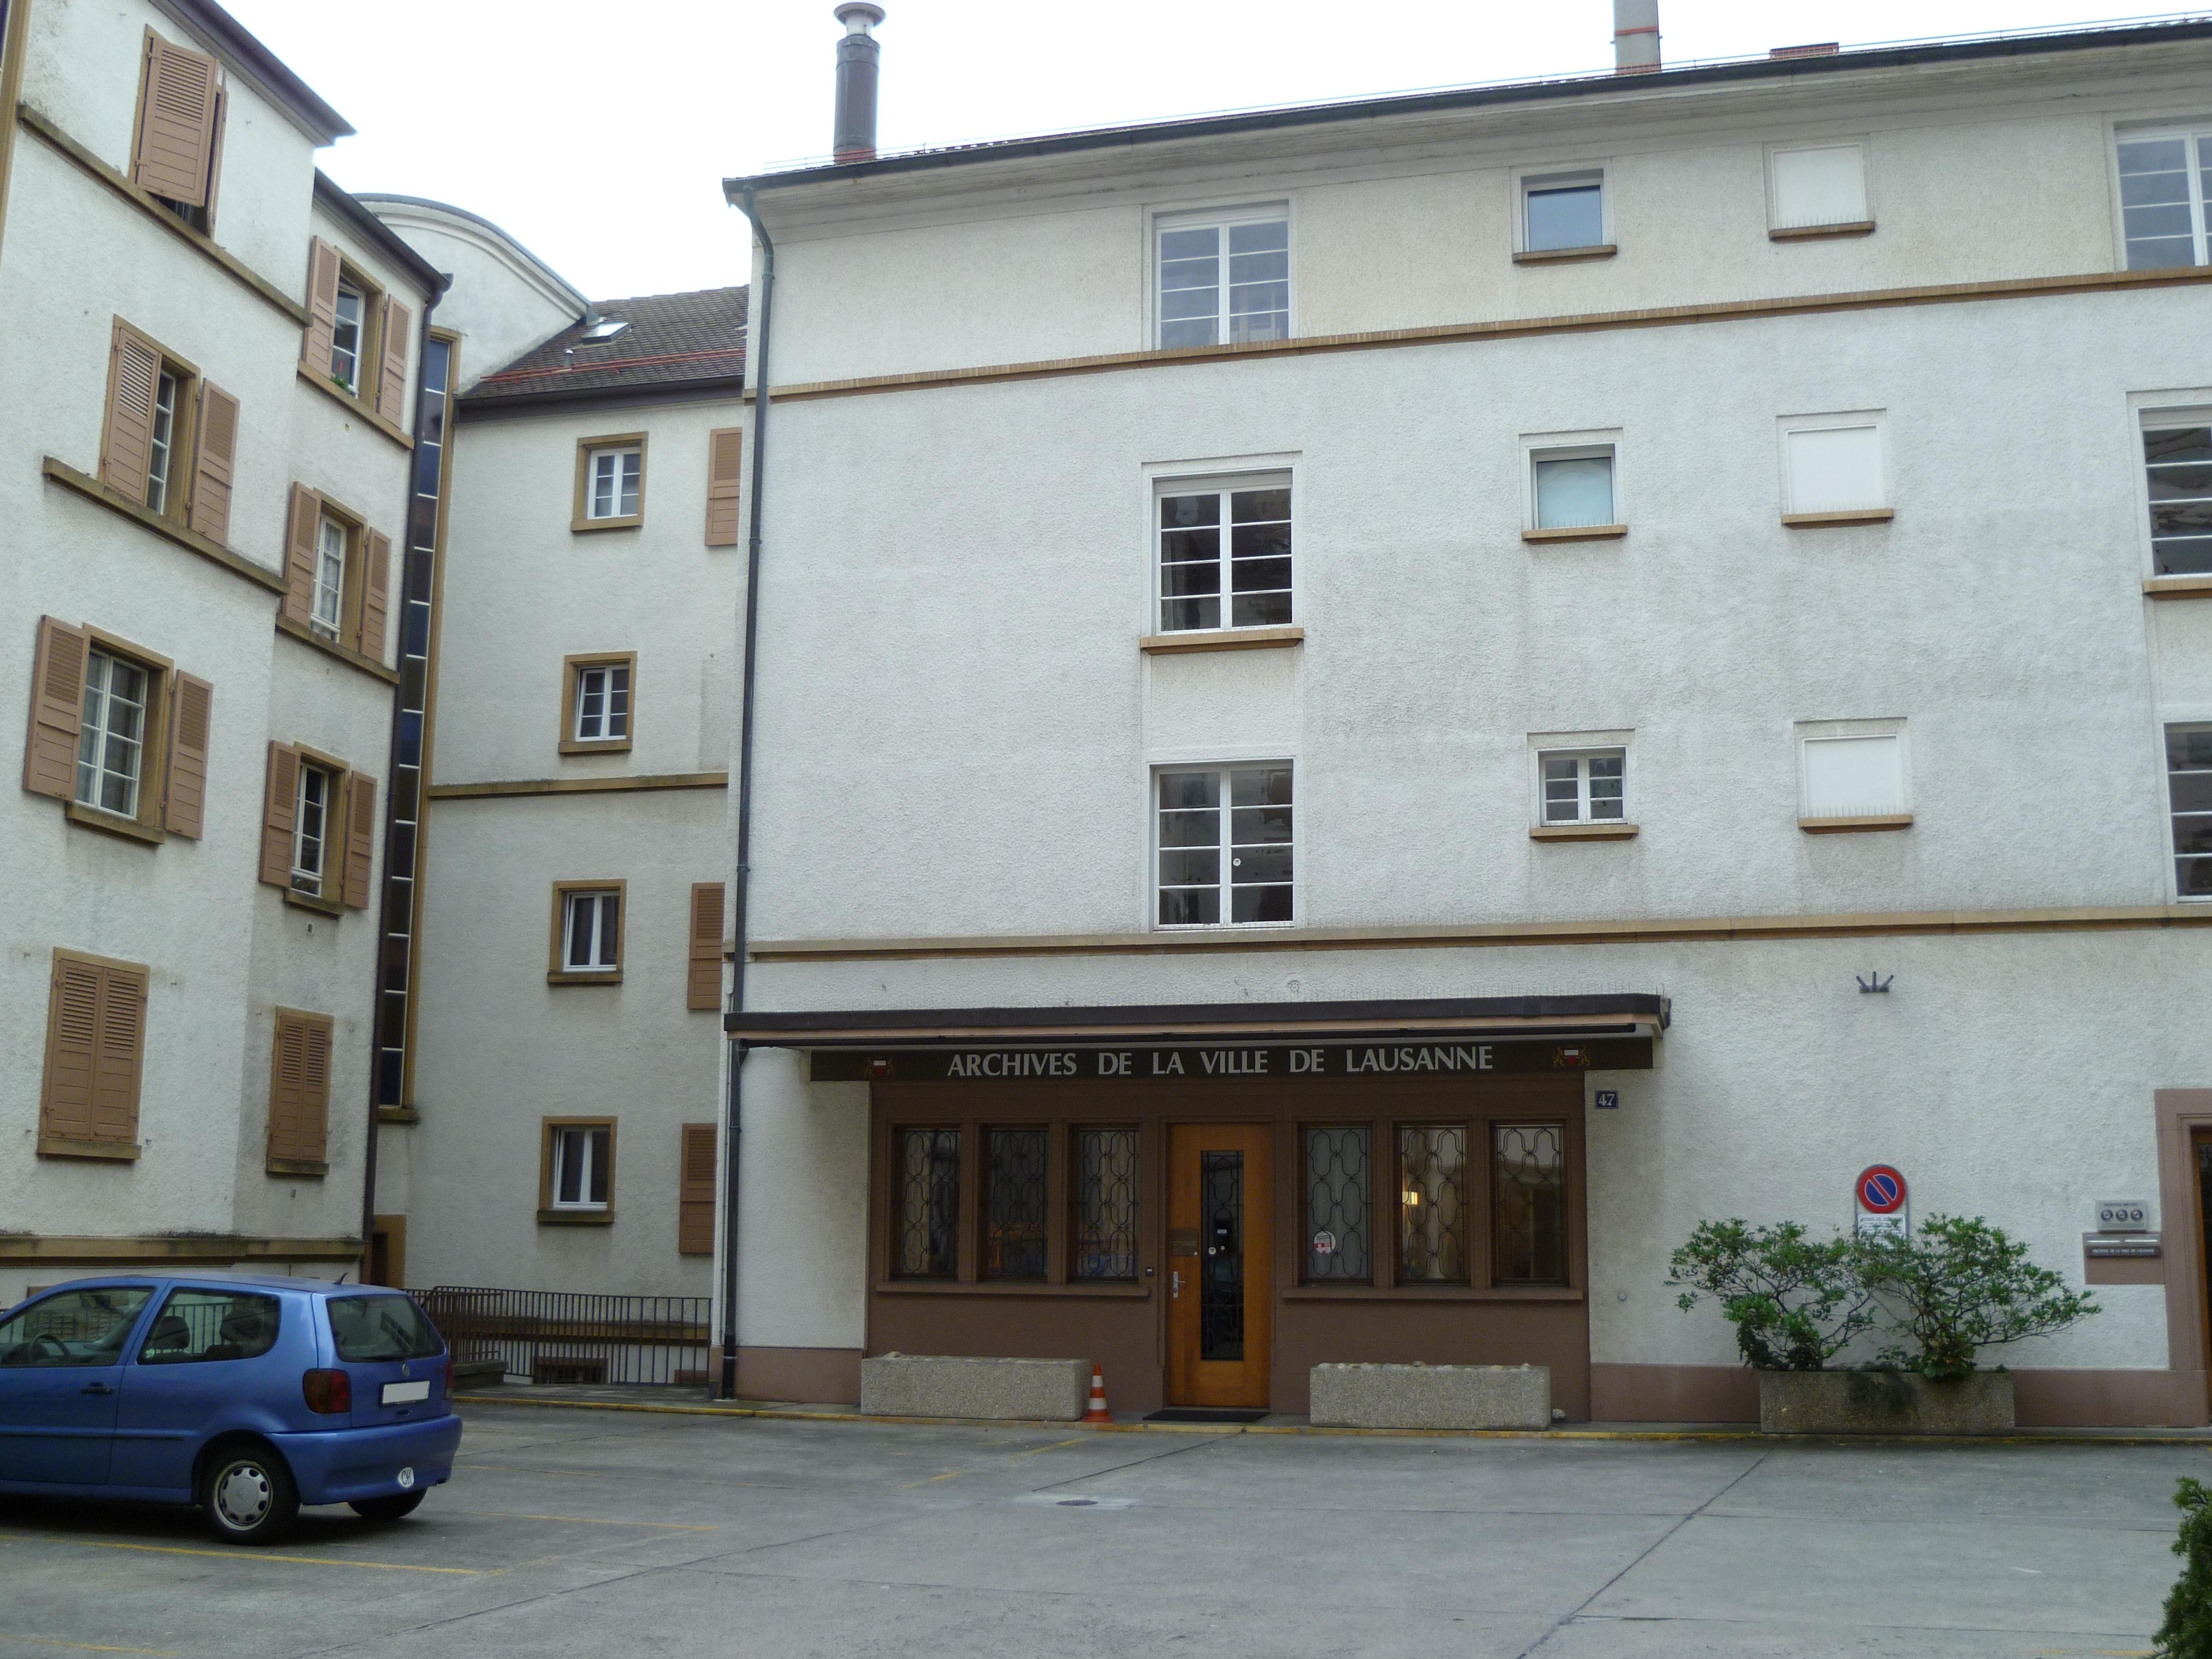 Stadtarchiv Lausanne